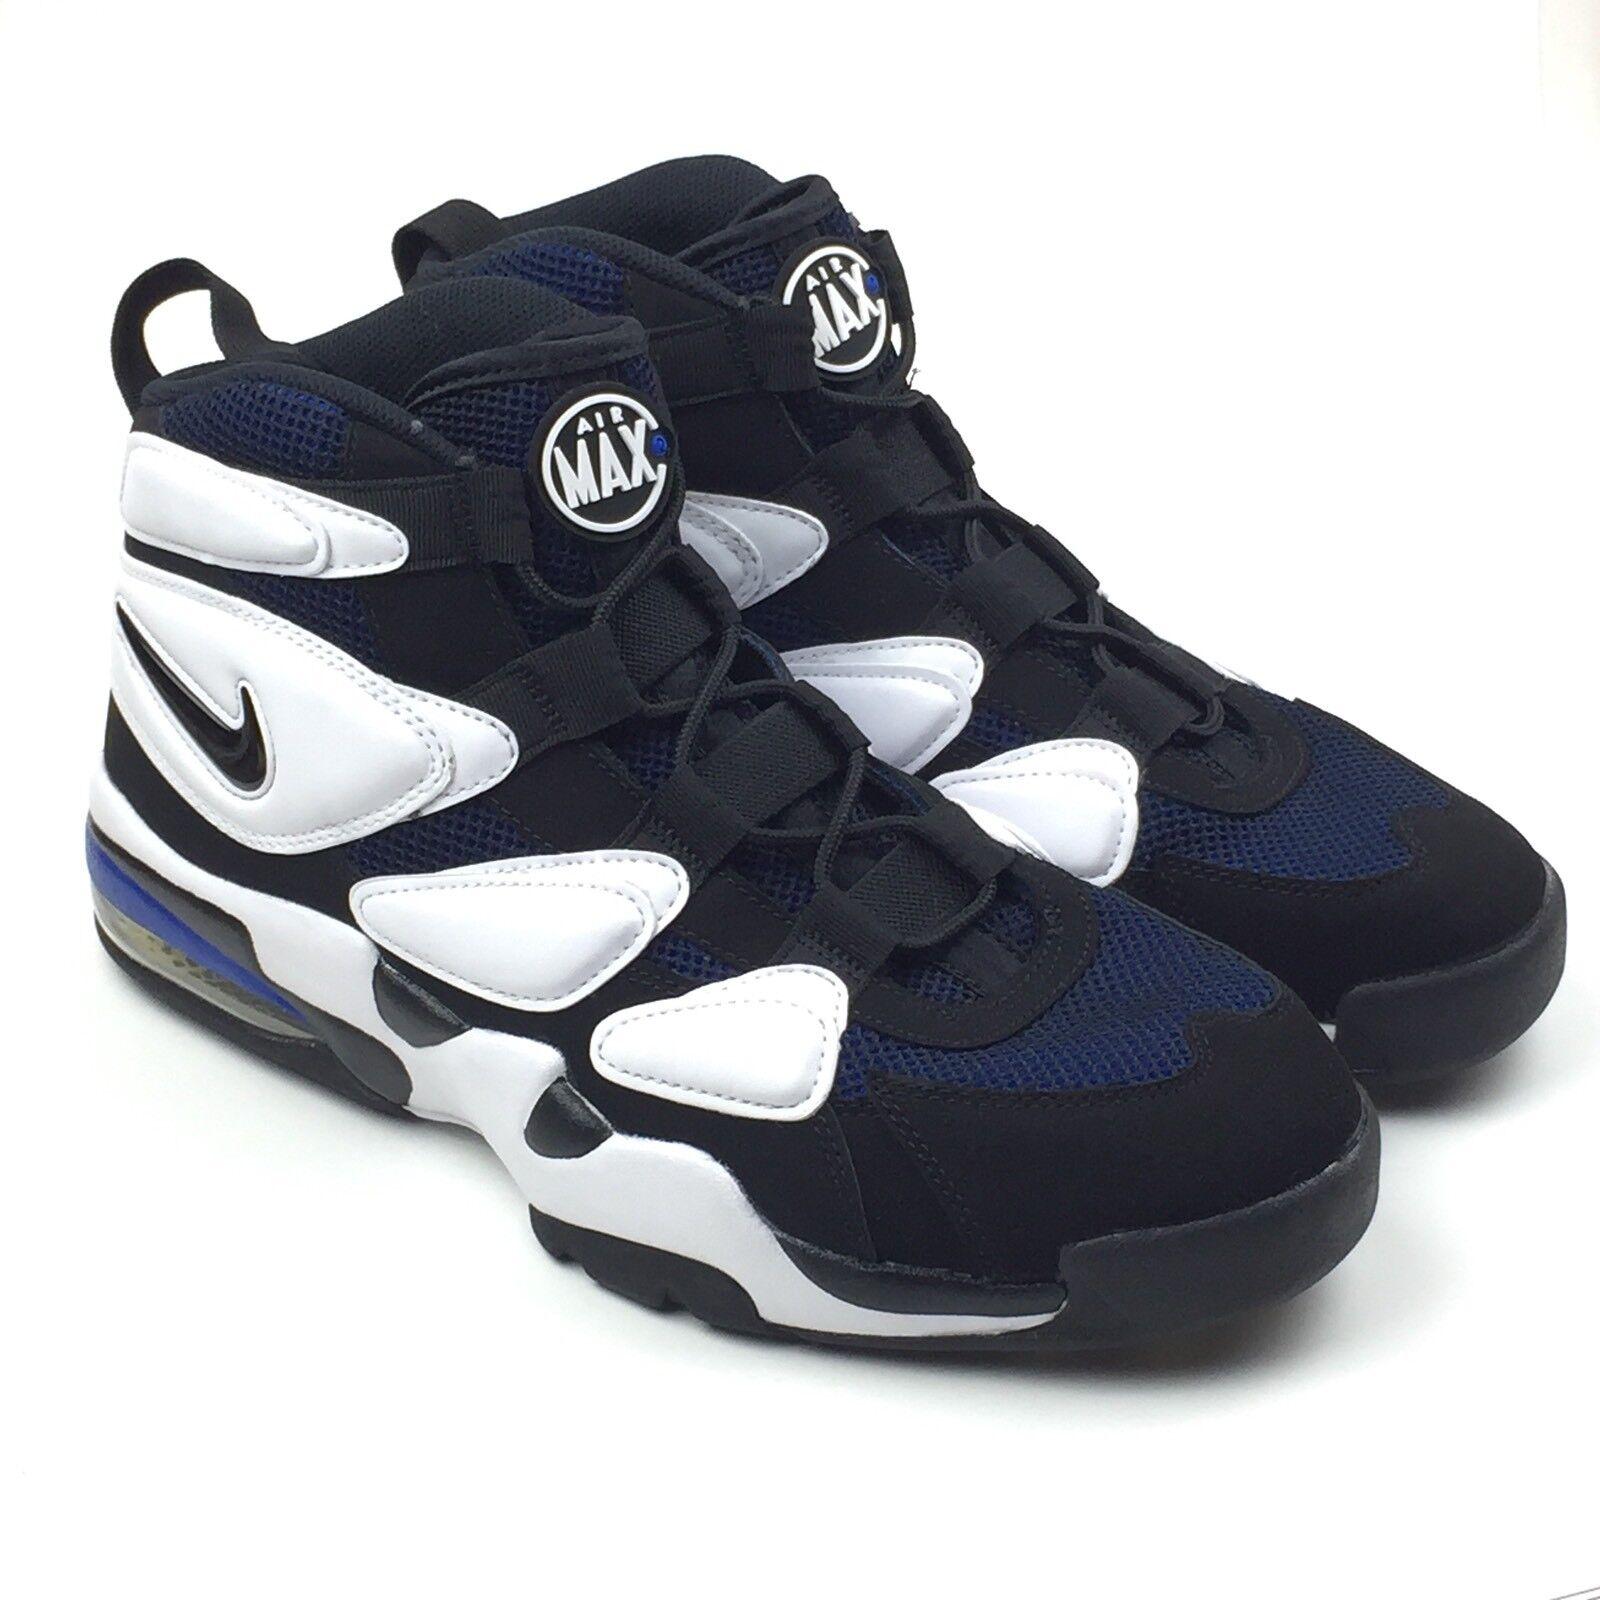 Nike air max 2 nero ritmo 94 duca bianco nero 2 blu misura 13 nuovi 922934-101 9eae0a